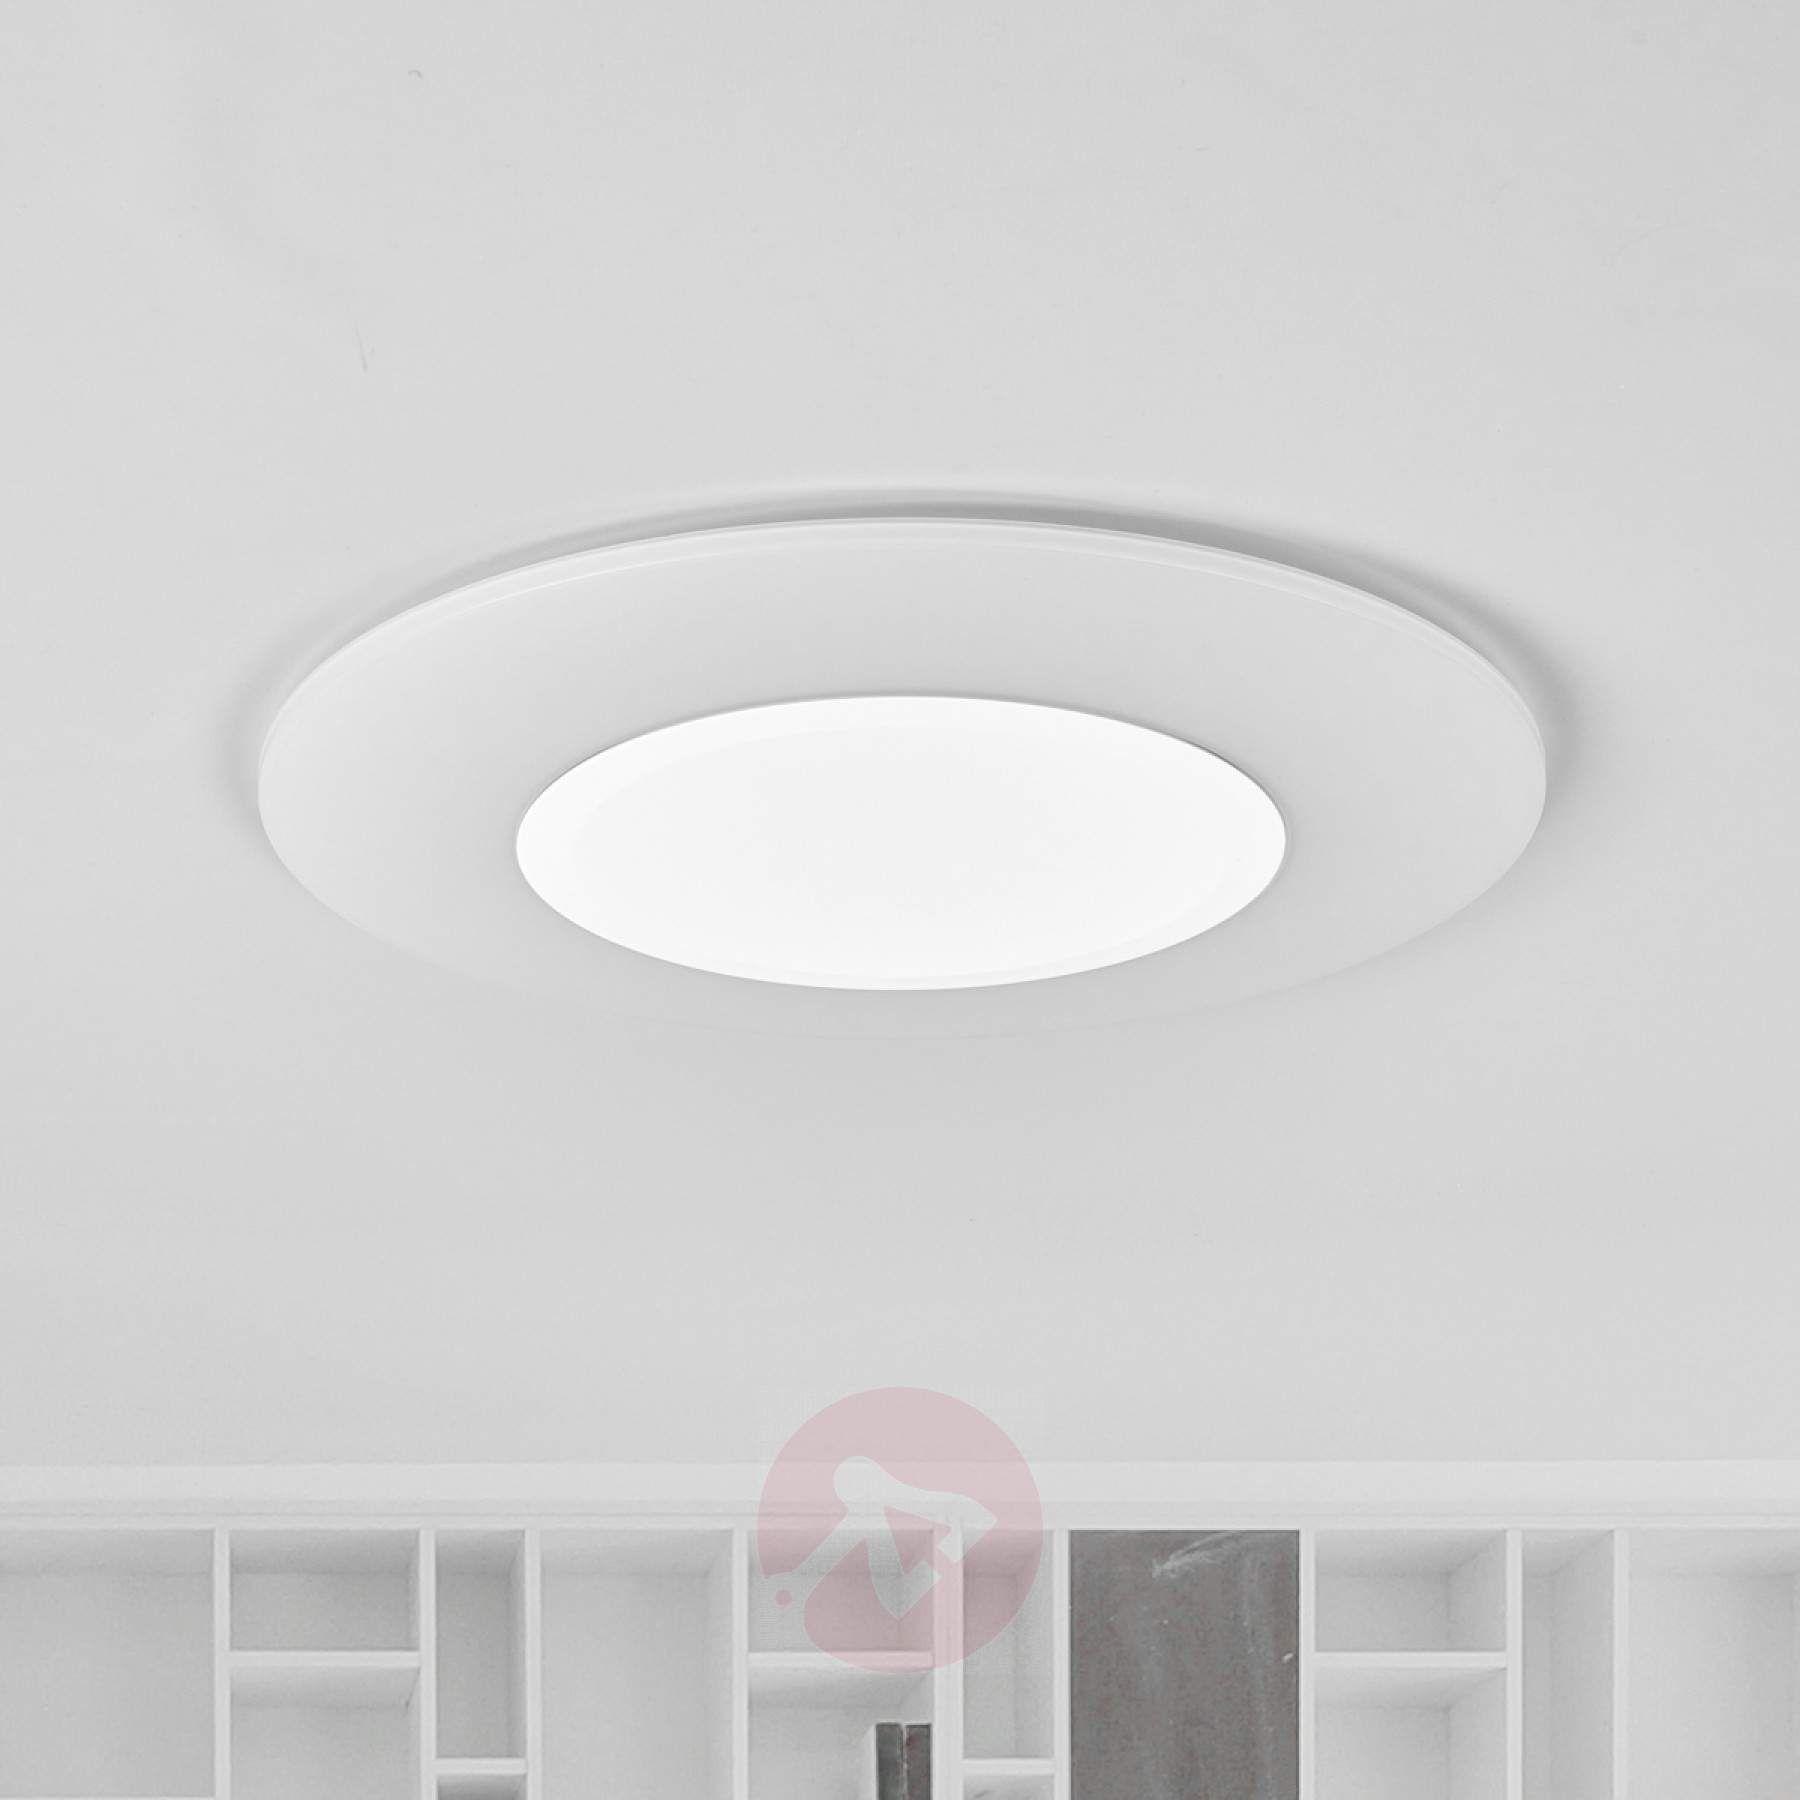 Very Flat Ceiling Light Led Flat 1 200 Lumens 7261139 01 Ceiling